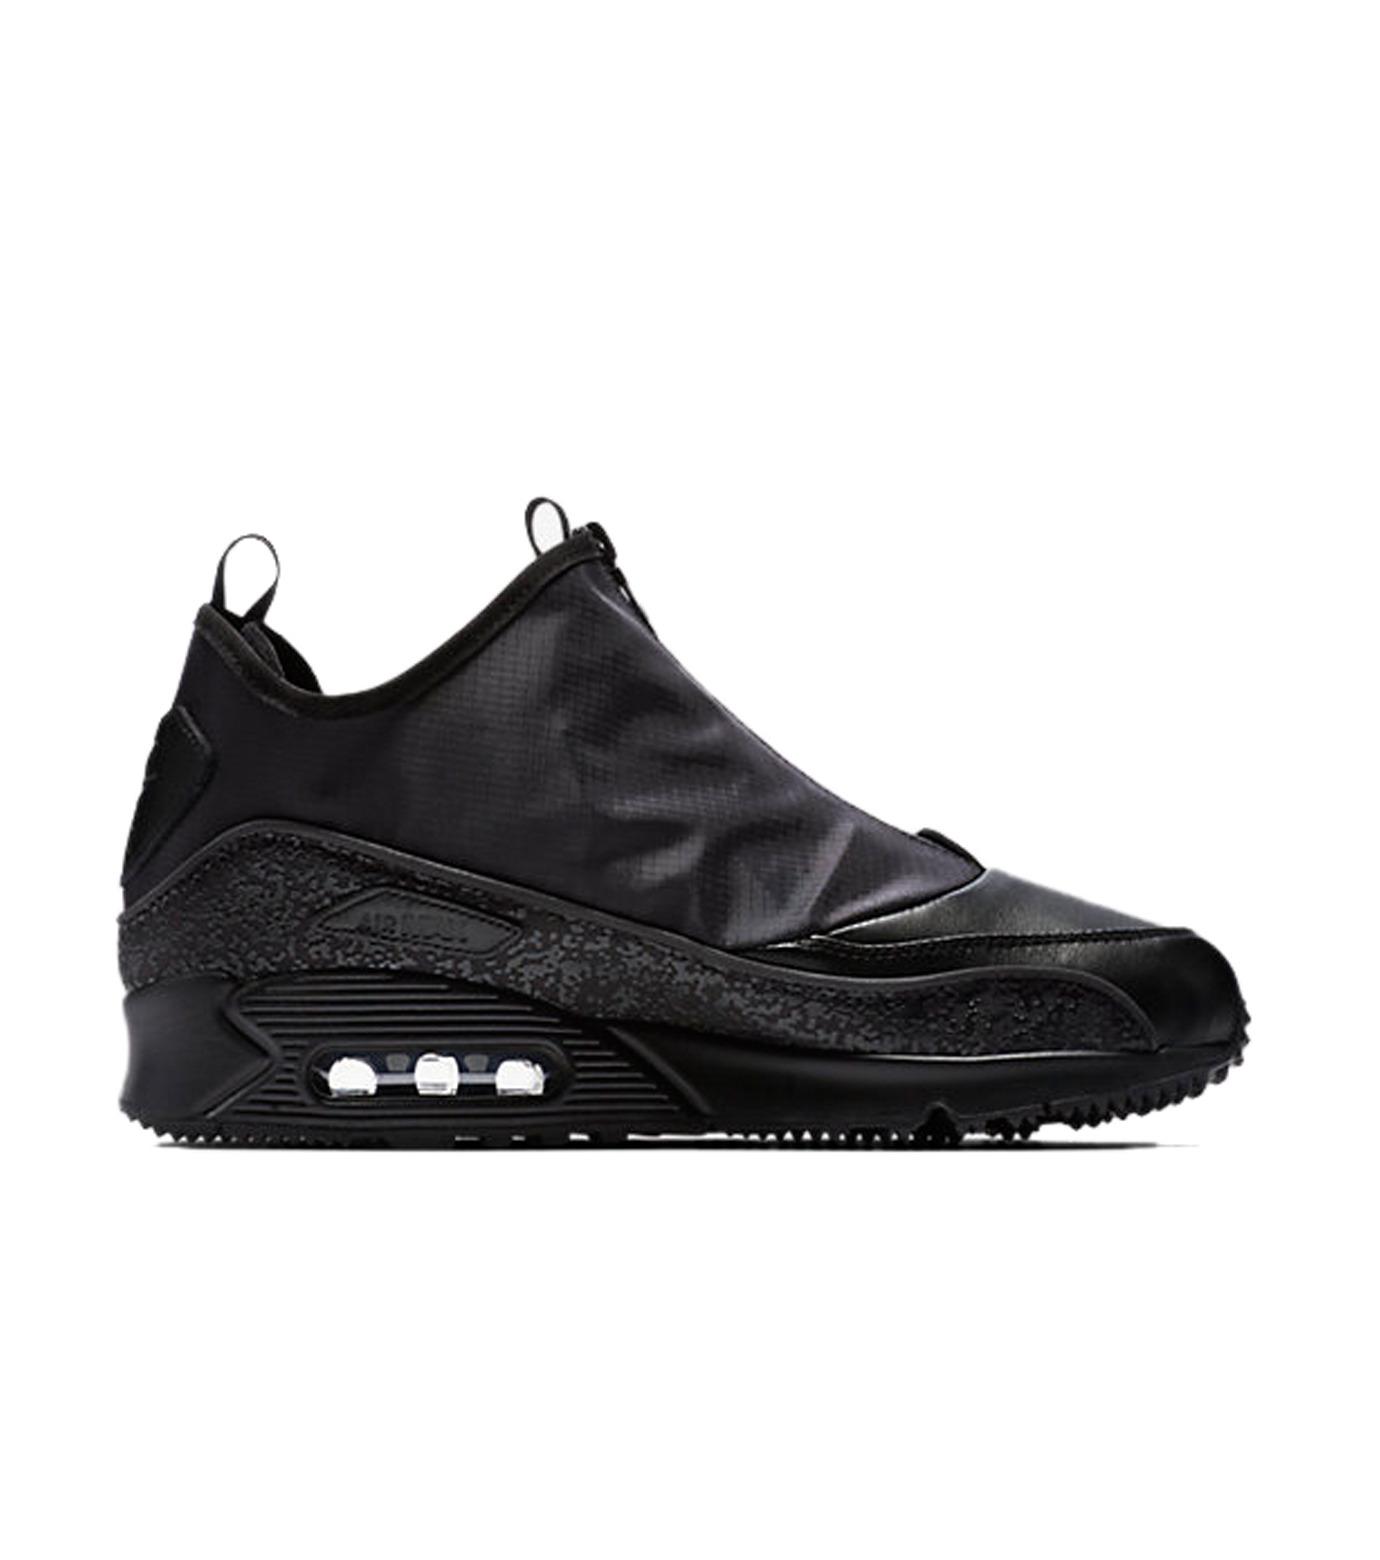 NIKE(ナイキ)のAIR MAX 90 UTILITY-BLACK(シューズ/shoes)-858956-001-13 拡大詳細画像1